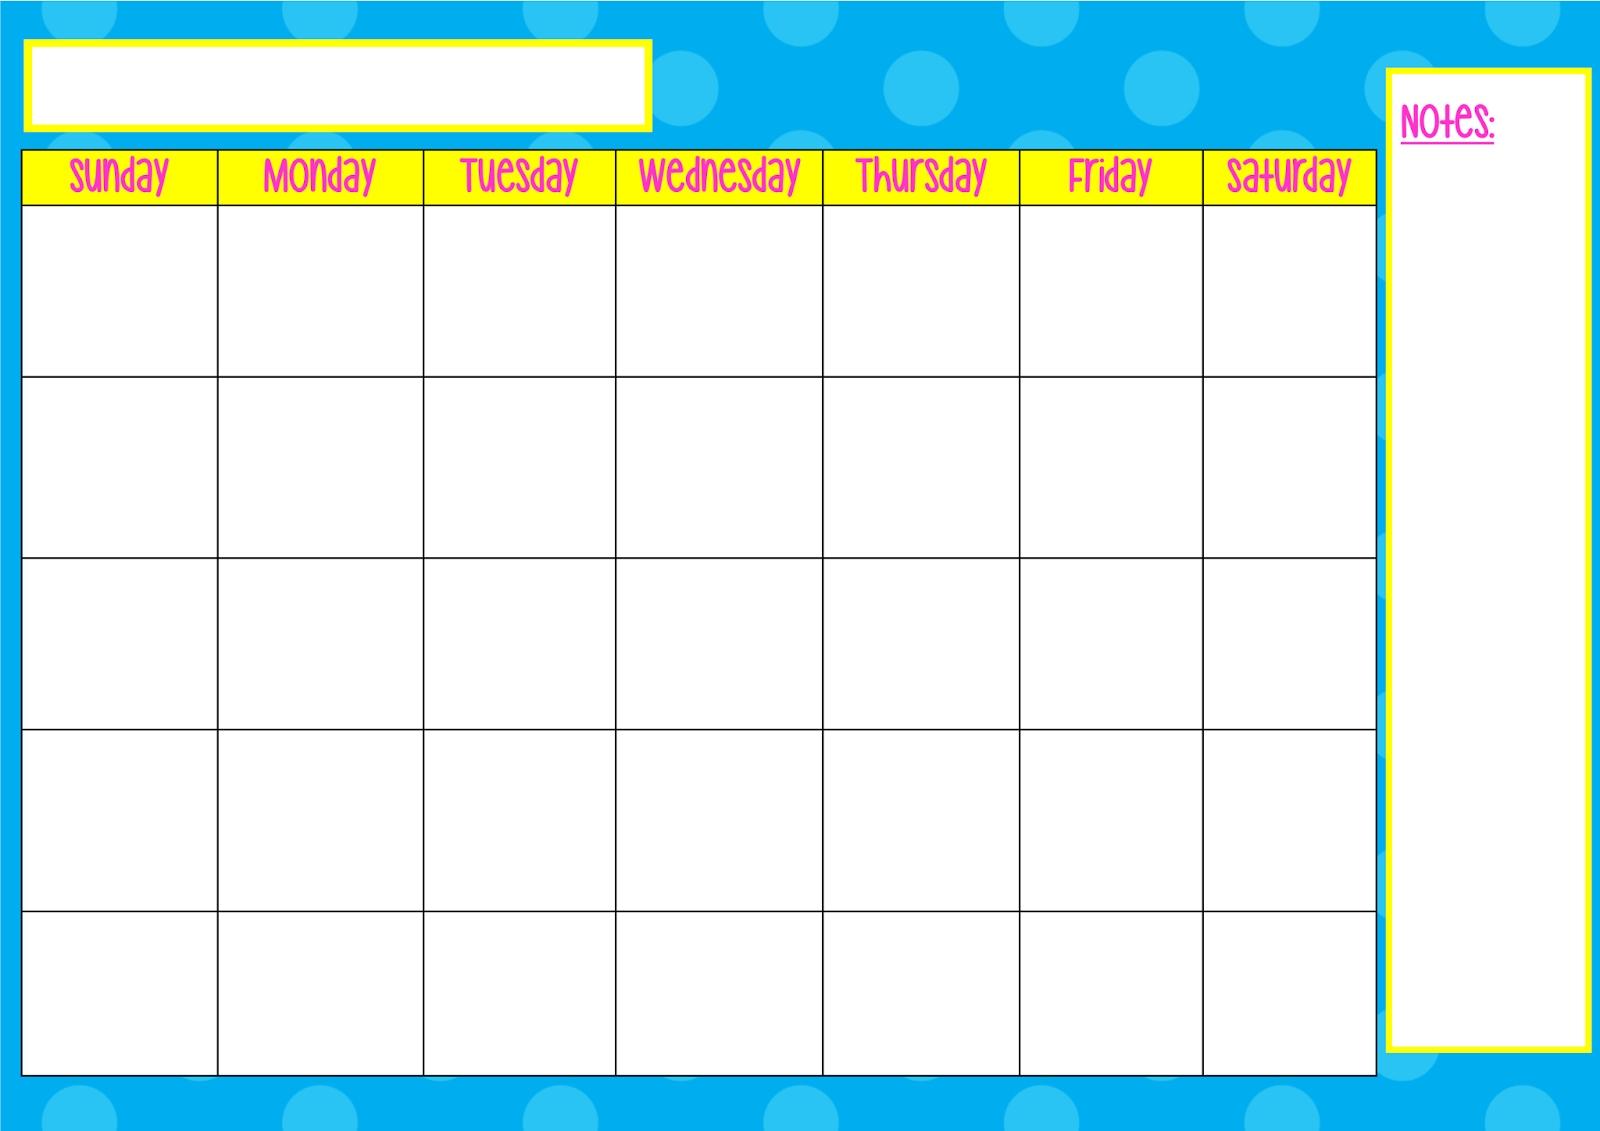 Monday Through Friday Calendar Commonpenceco  Xjb